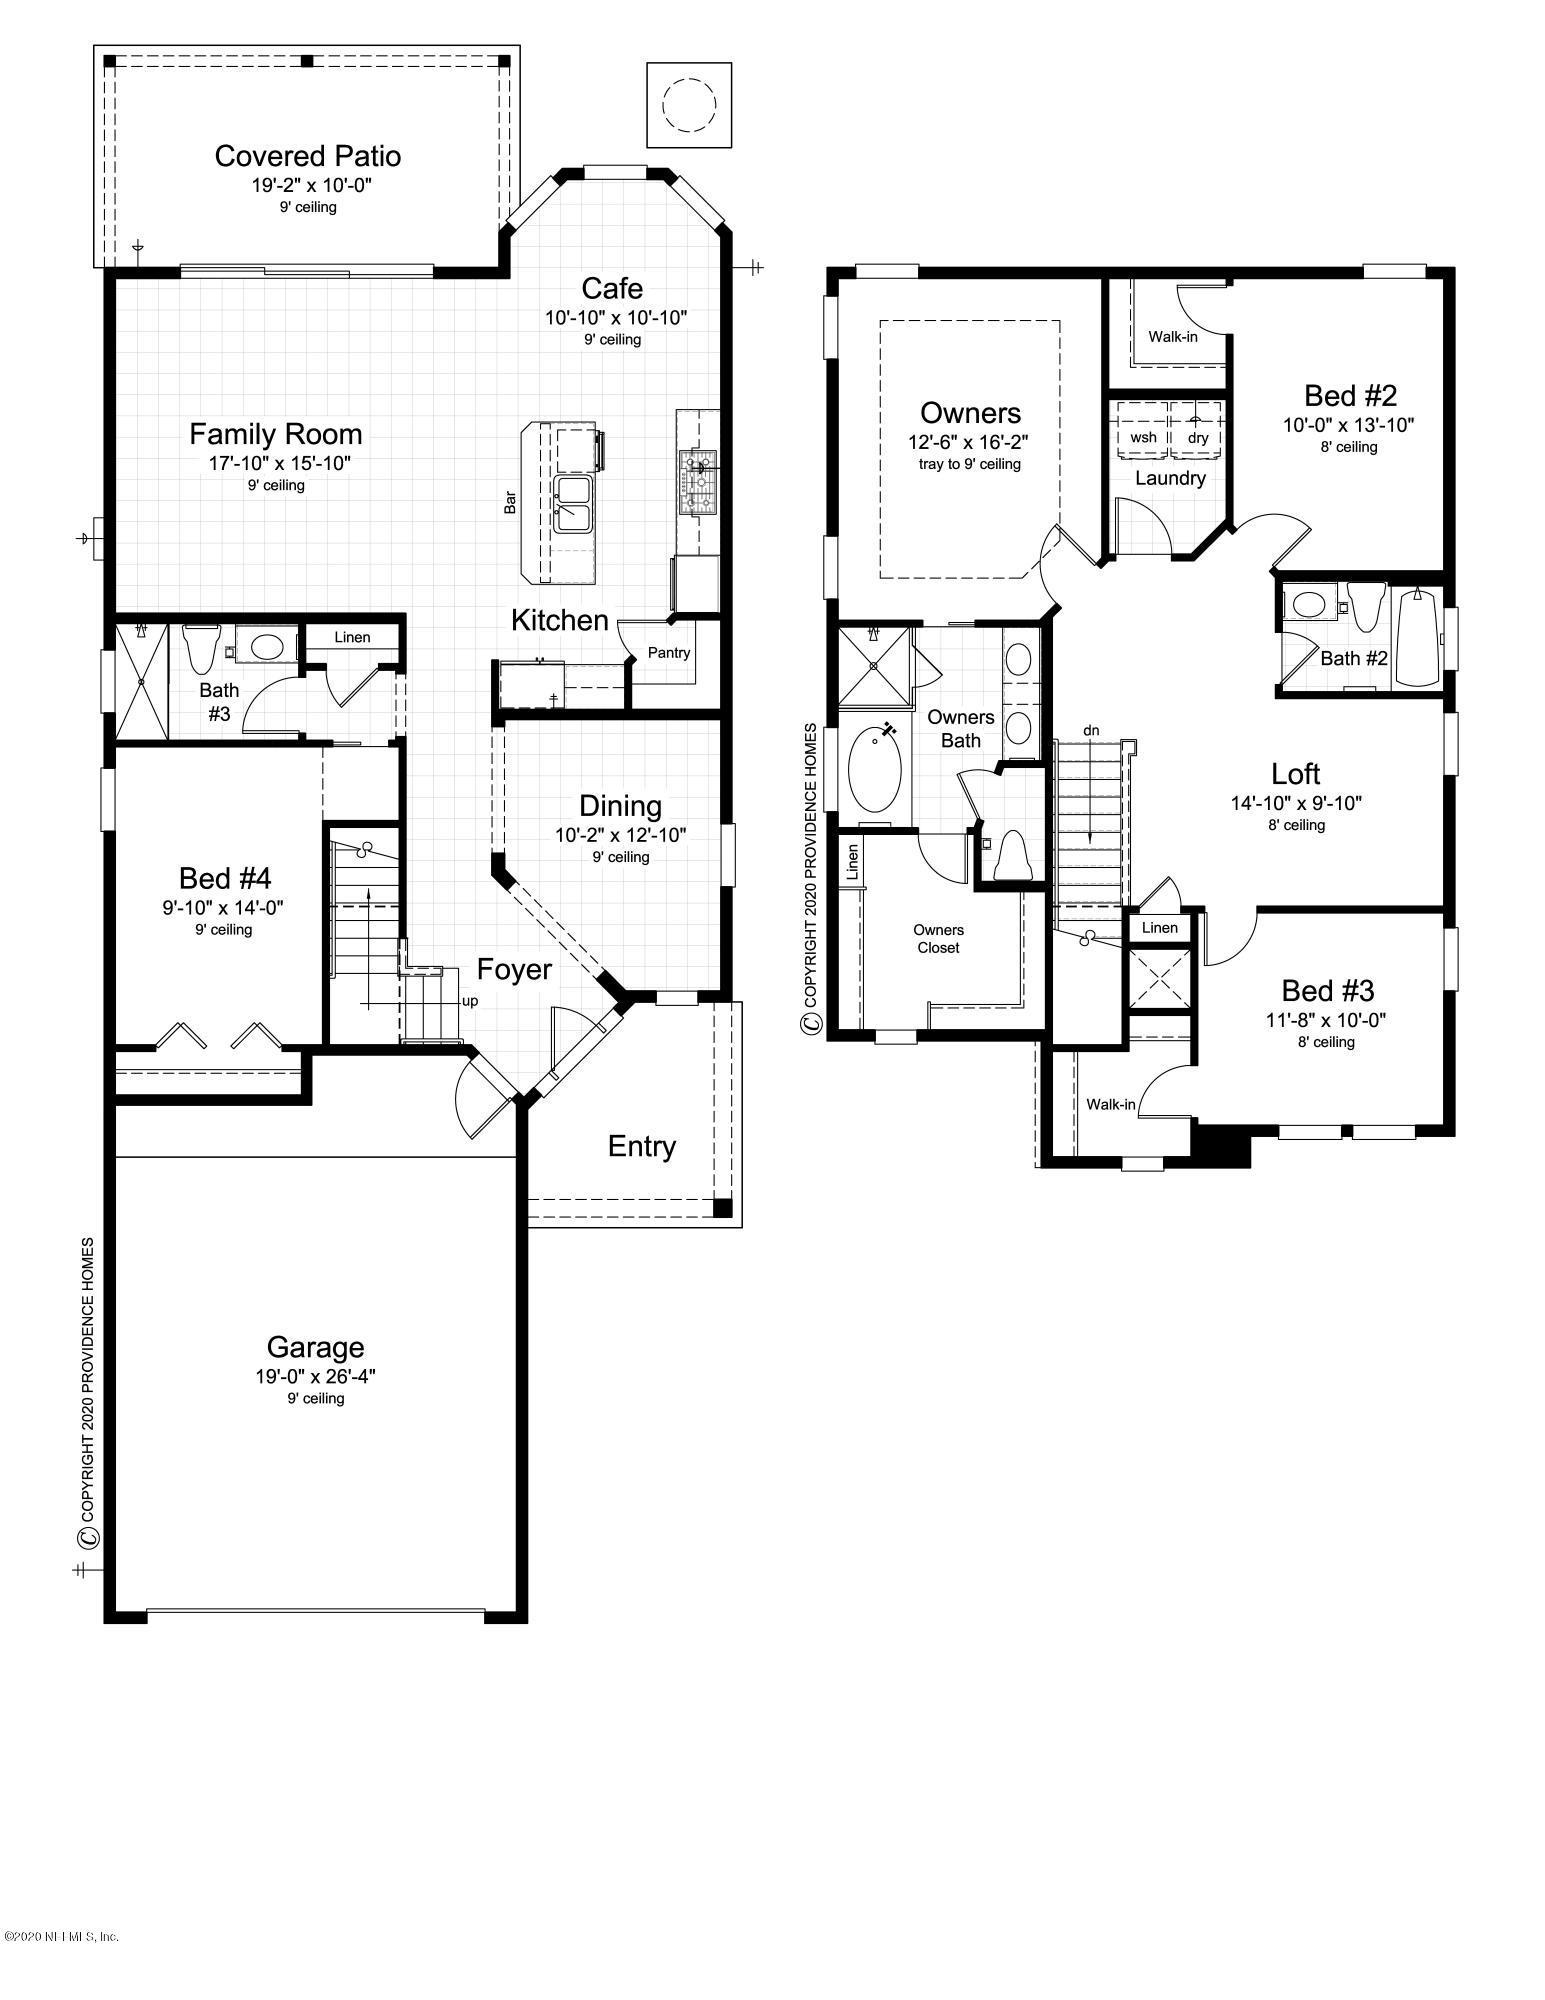 300 PIONEER VILLAGE, PONTE VEDRA, FLORIDA 32081, 4 Bedrooms Bedrooms, ,3 BathroomsBathrooms,Residential,For sale,PIONEER VILLAGE,1058120